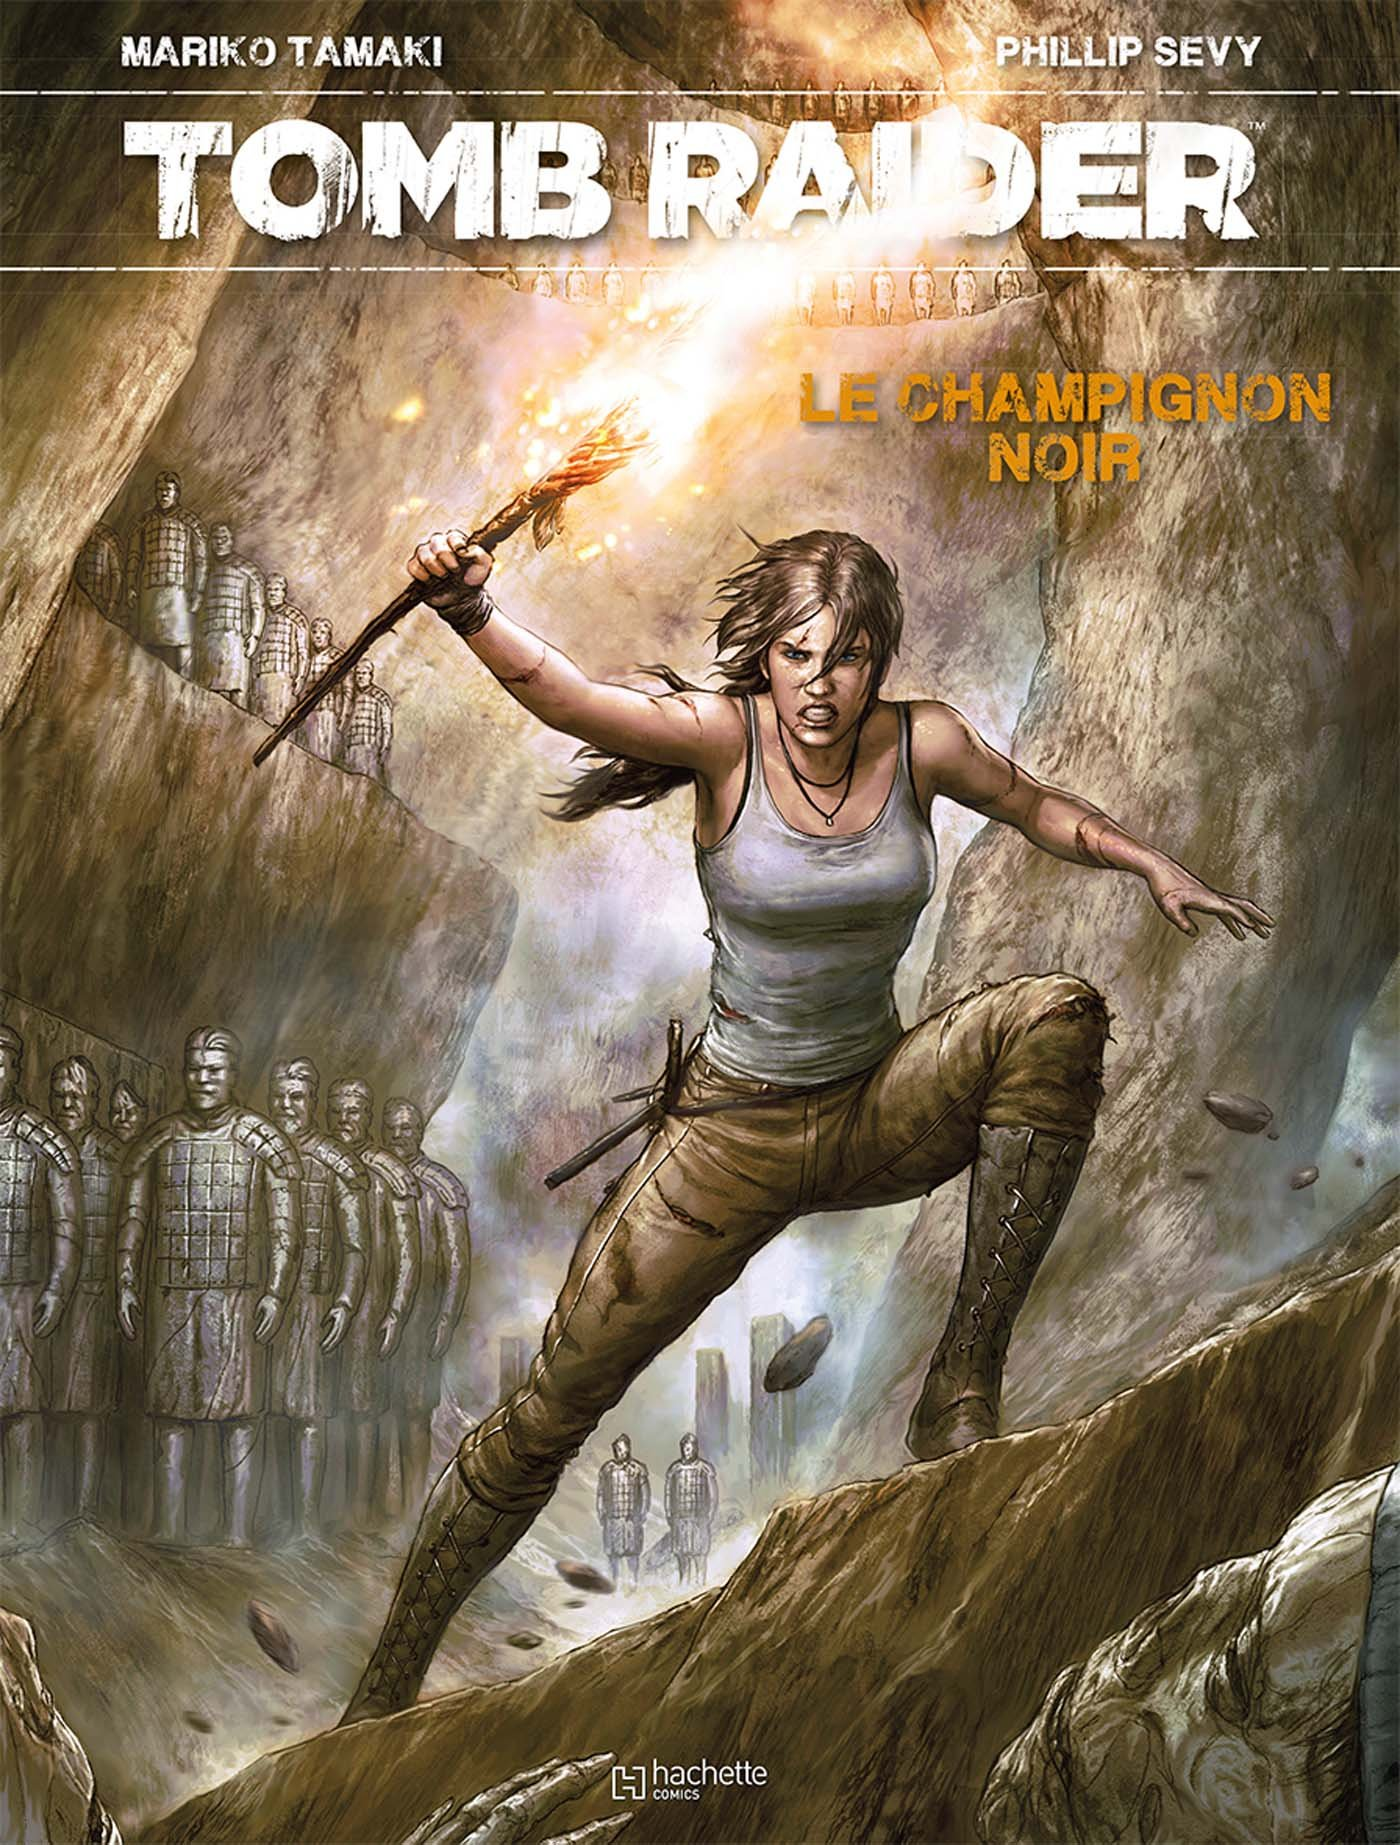 Lara Croft - Tomb Raider 1 - Tomb Raider - Le Champignon Noir